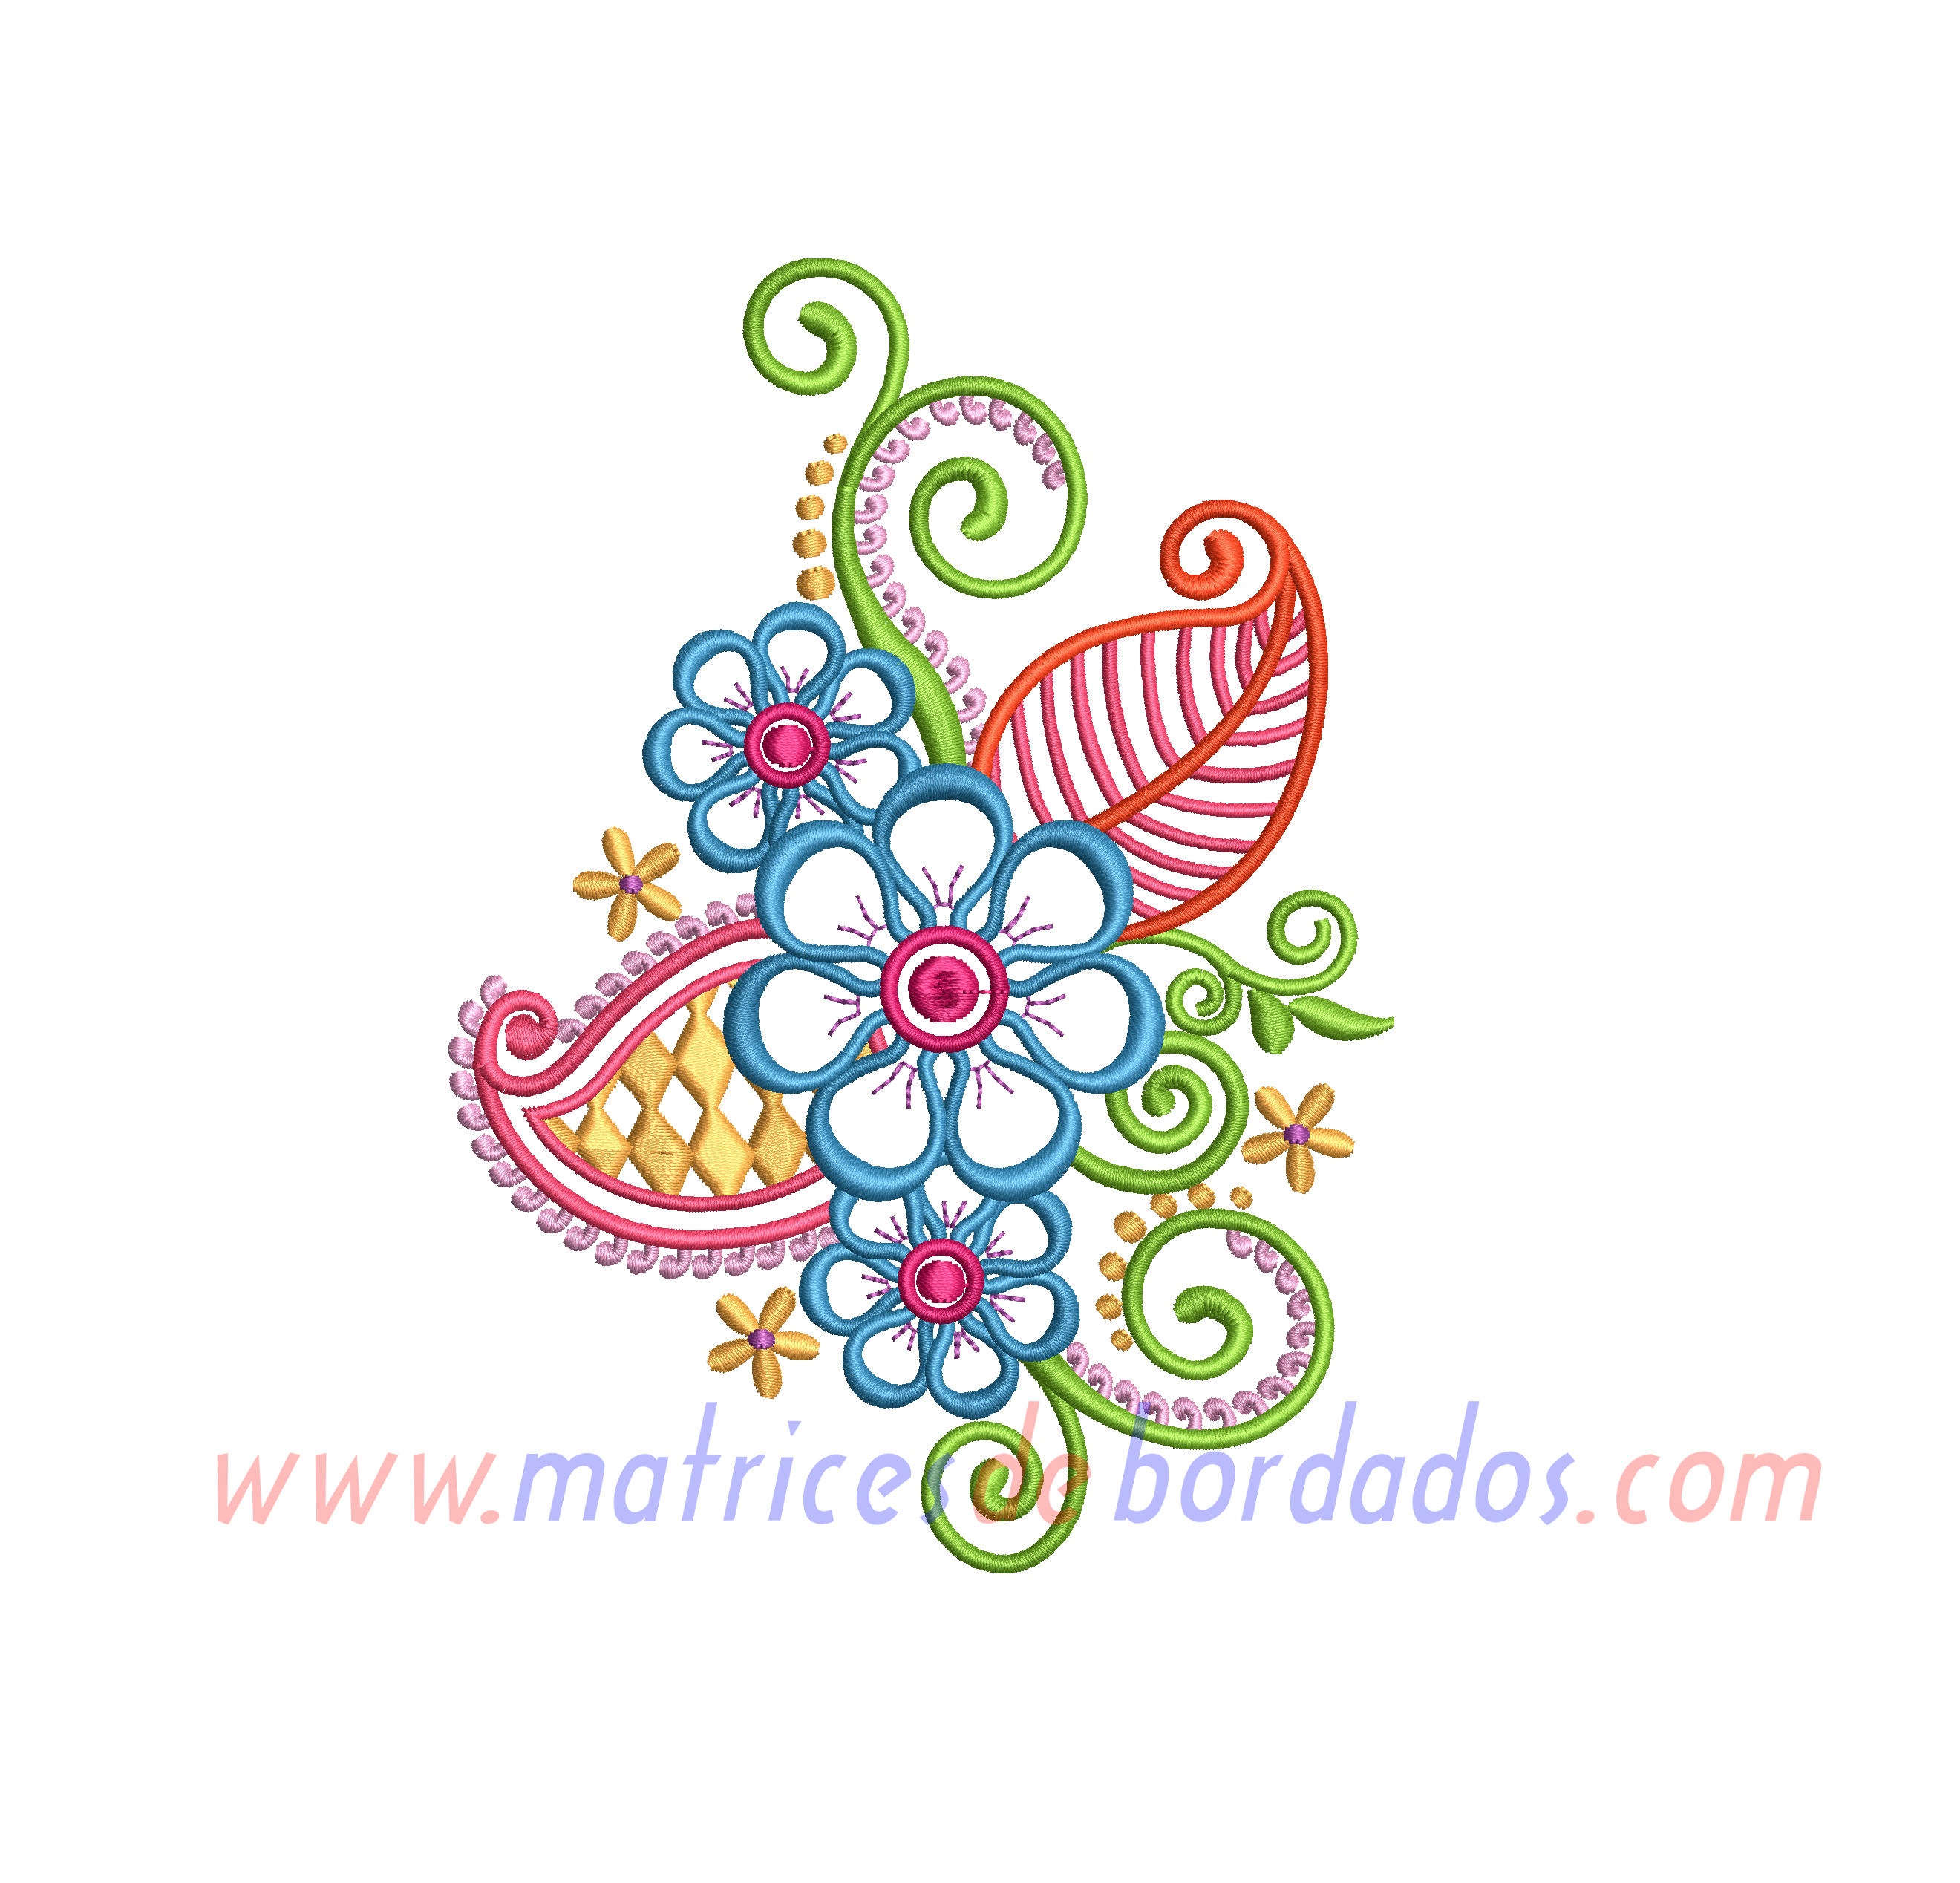 DW61ZW - Diseño Floral